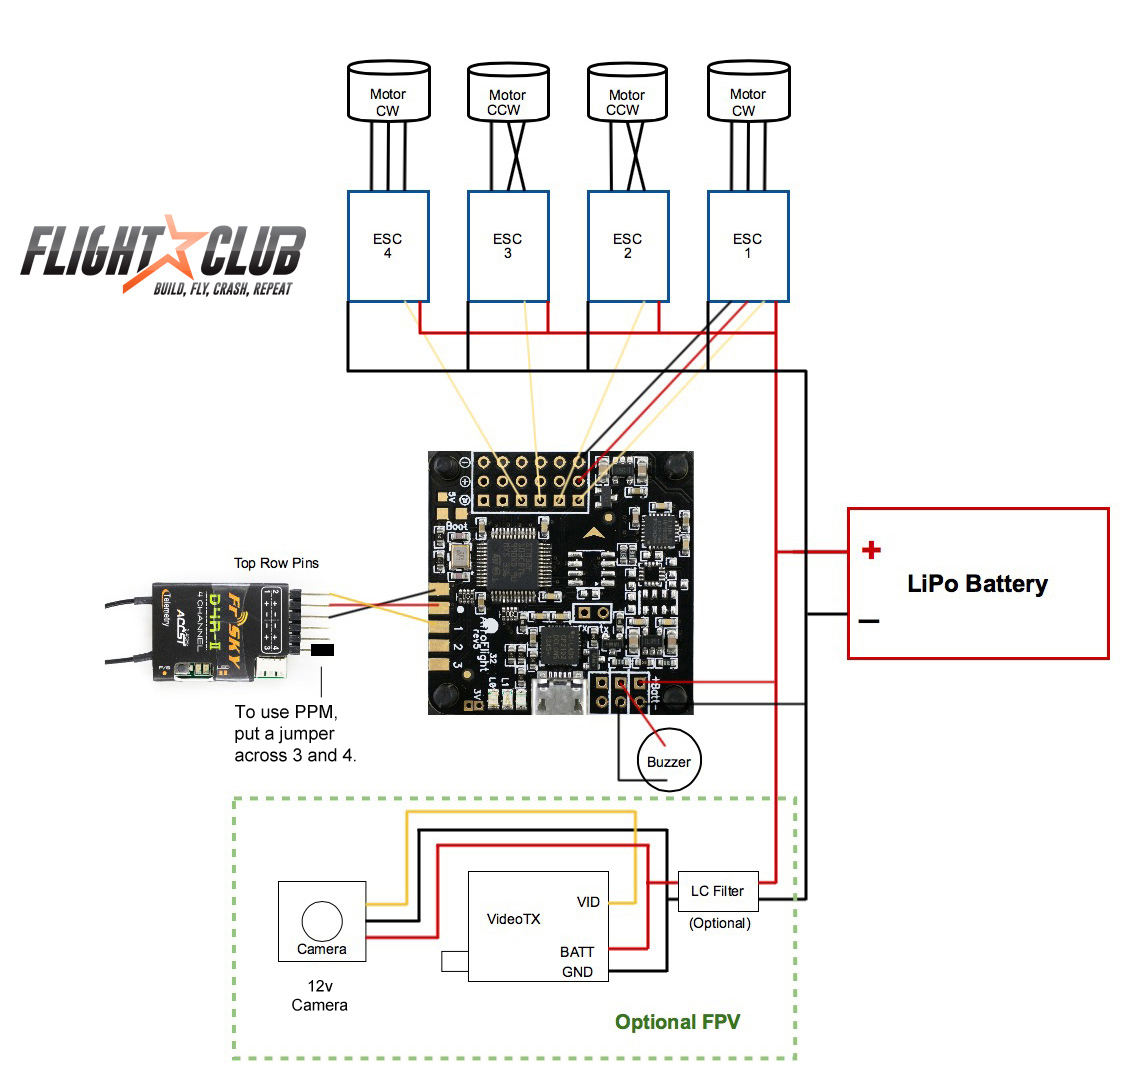 Cool kk2 wiring diagram circut photos wiring diagram ideas fascinating nighthawk 250 wiring diagram images best image swarovskicordoba Image collections